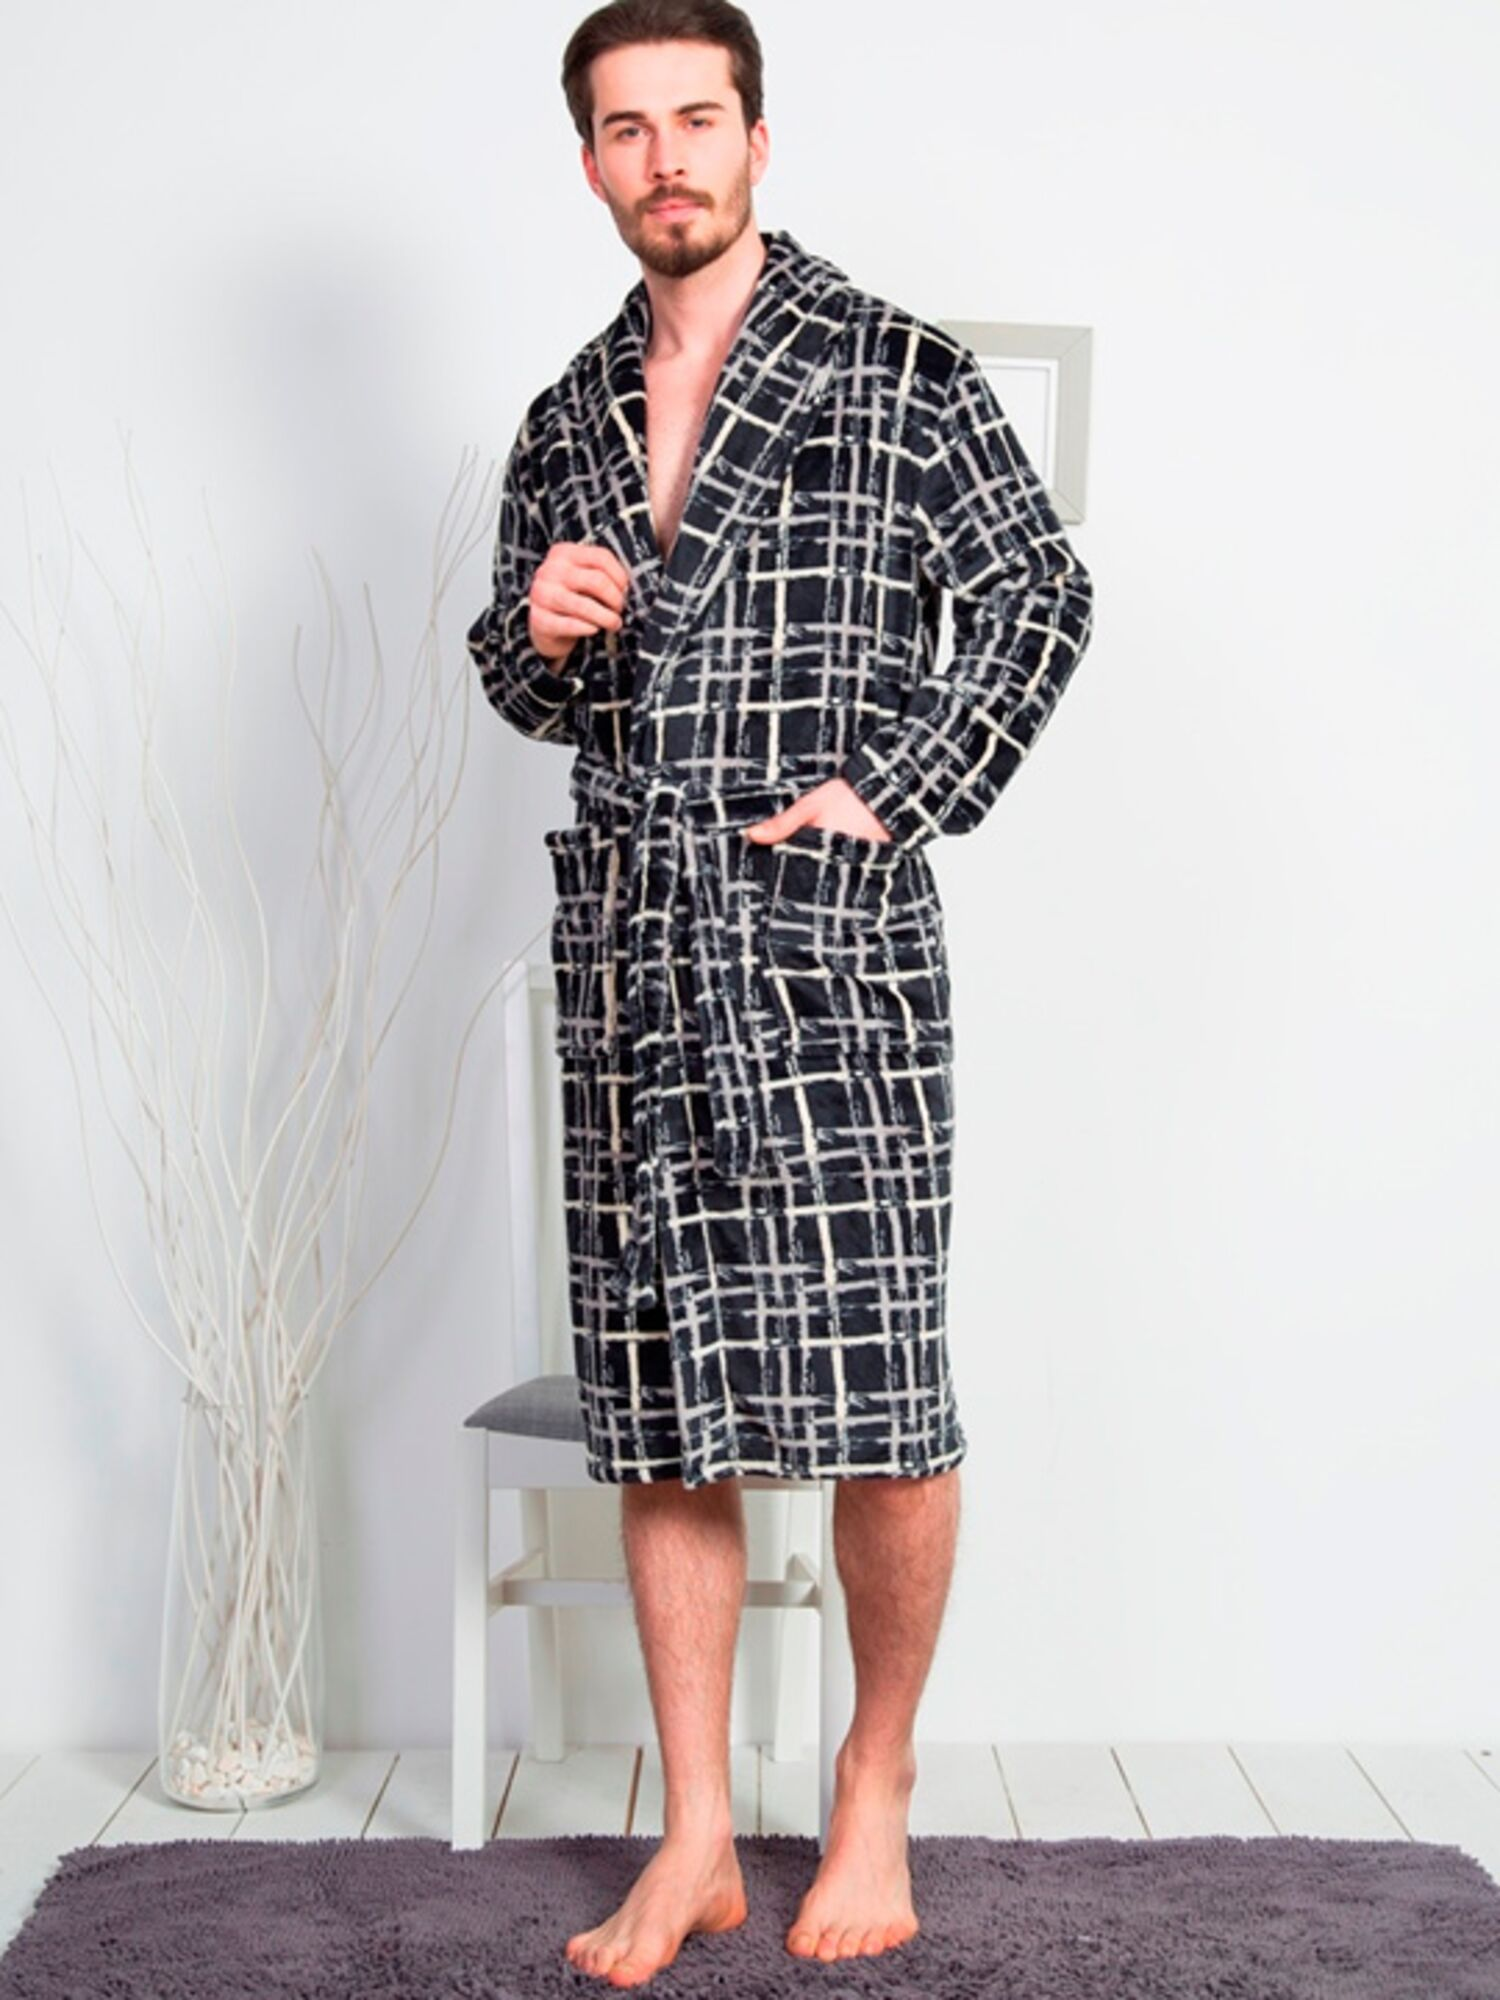 Халат мужской длинный Soft №160503 1056, серый, Vienetta